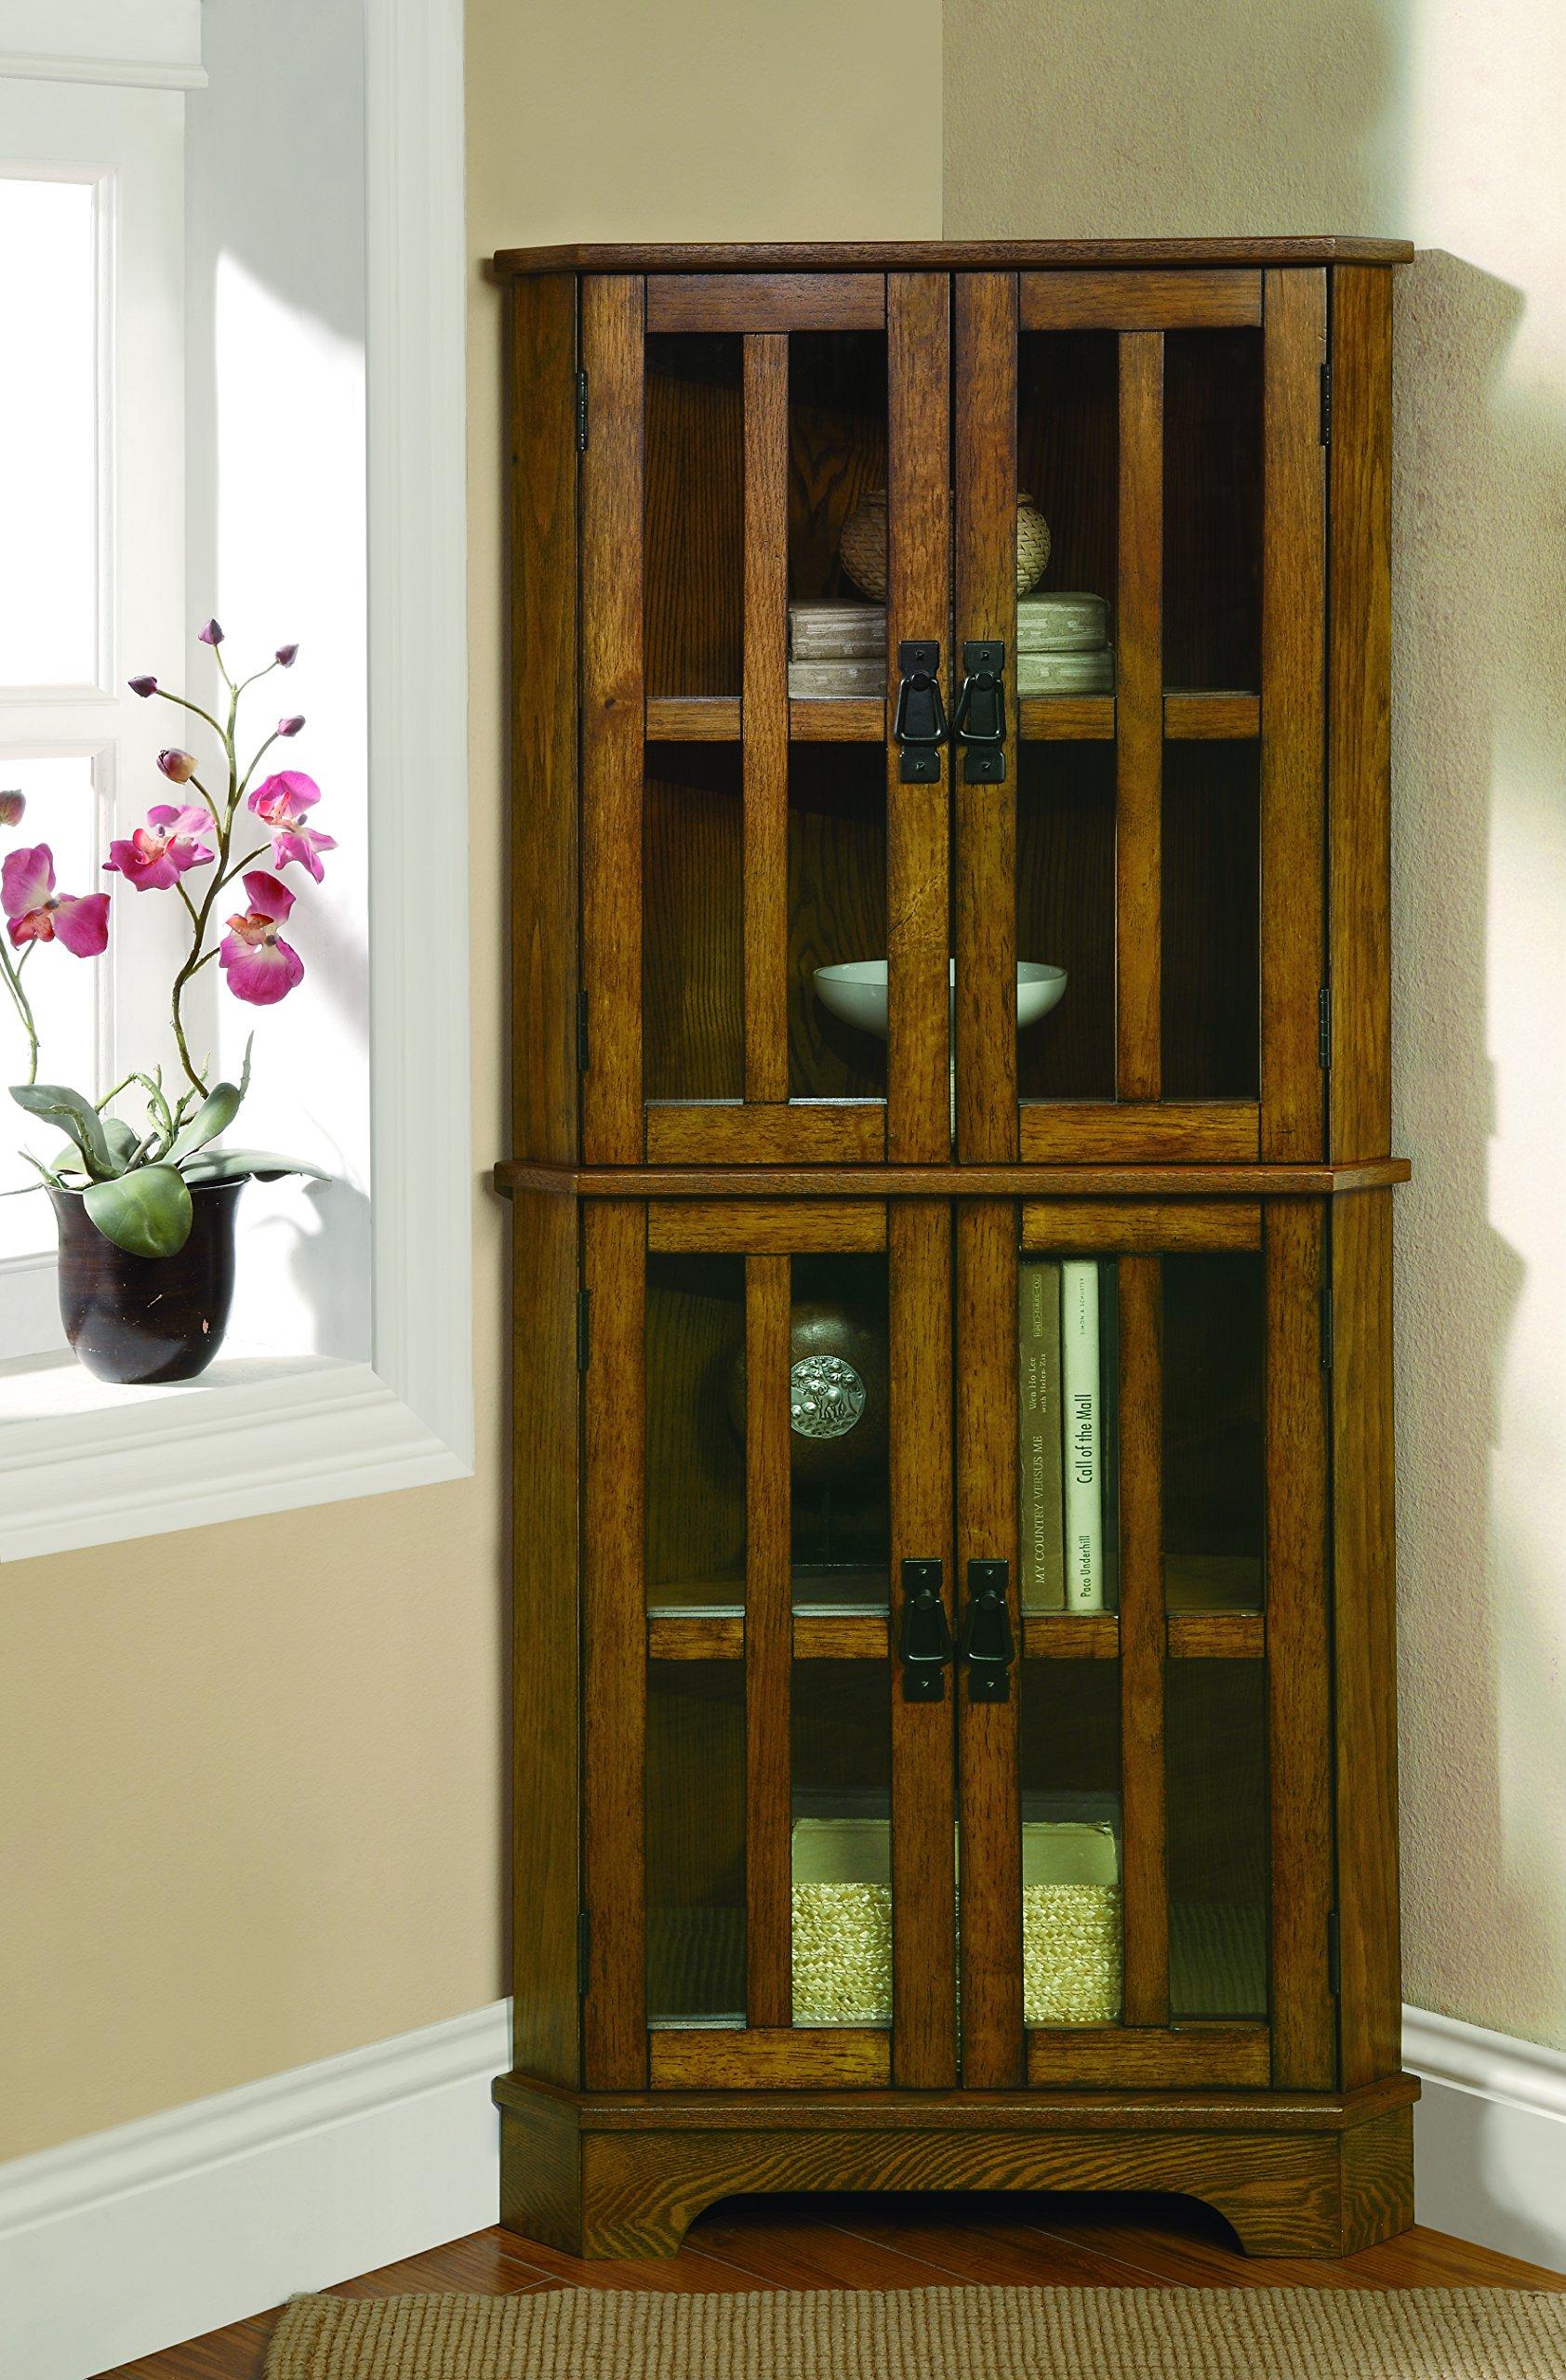 Coaster Home Furnishings 4-Shelf Corner Curio Cabinet Golden Brown by Coaster Home Furnishings